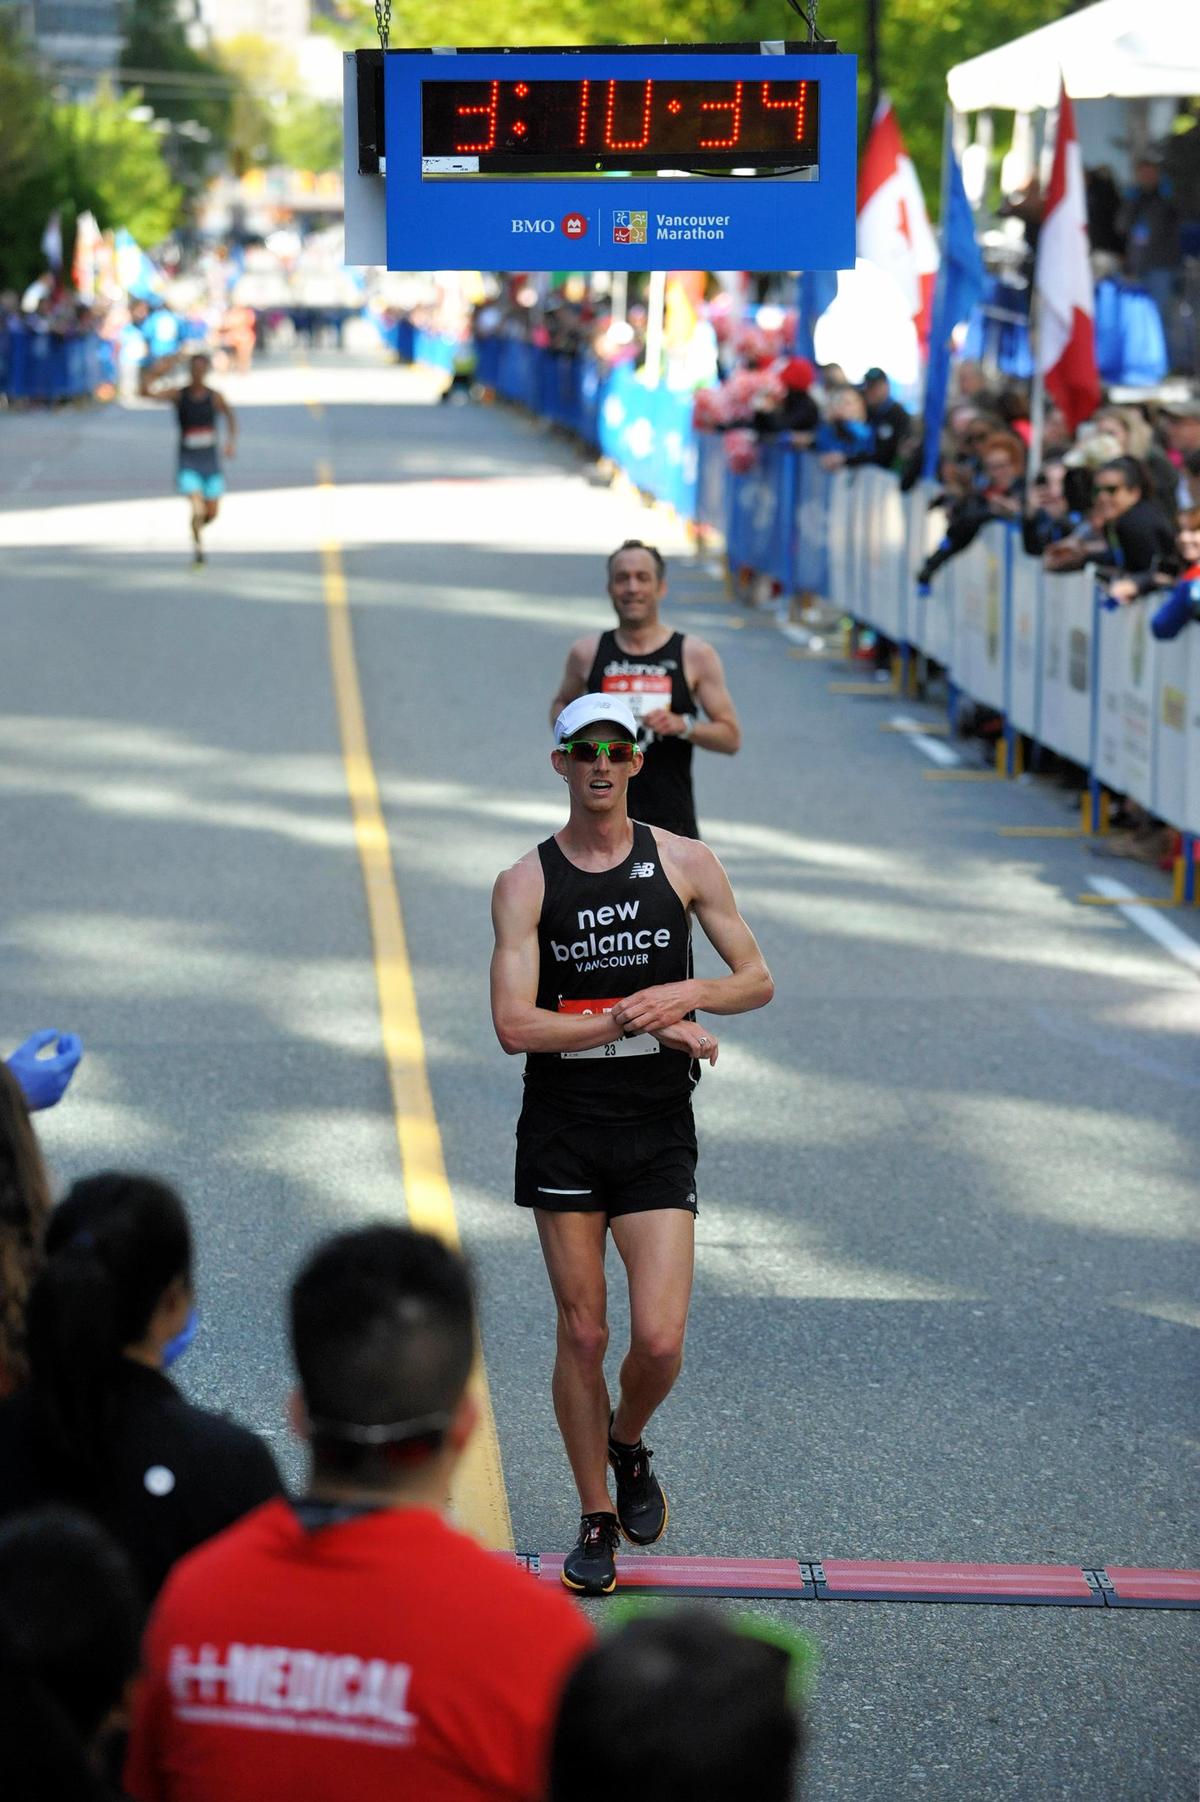 49-2017-EvanDunfee-OlympianRaceWalker-VancouverMarathon-MarathonFoto-RUNVAN-web